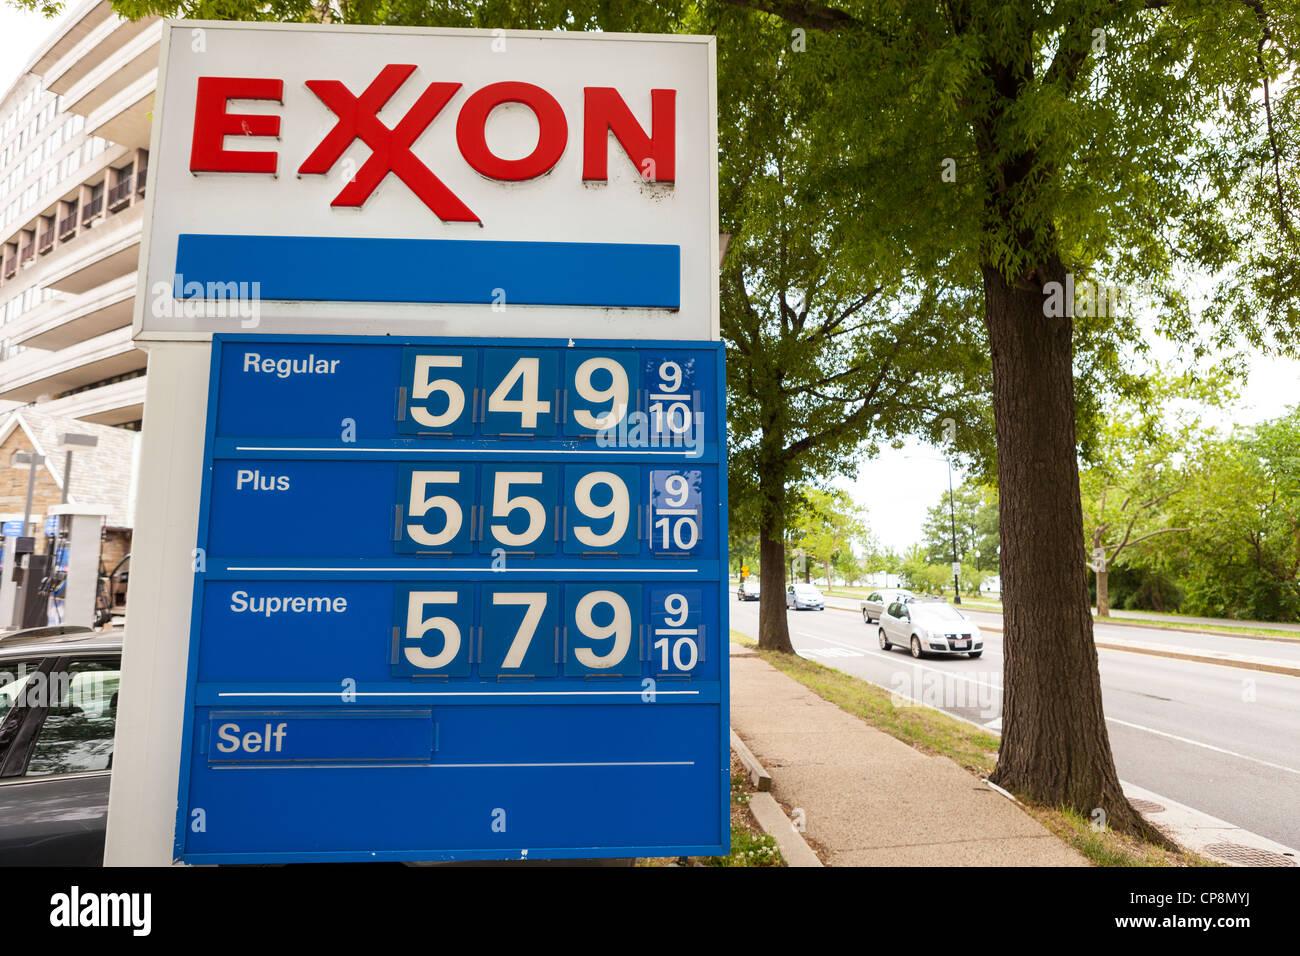 WASHINGTON, DC, USA - $5 gas price sign at Exxon service station on May 7, 2012. Stock Photo